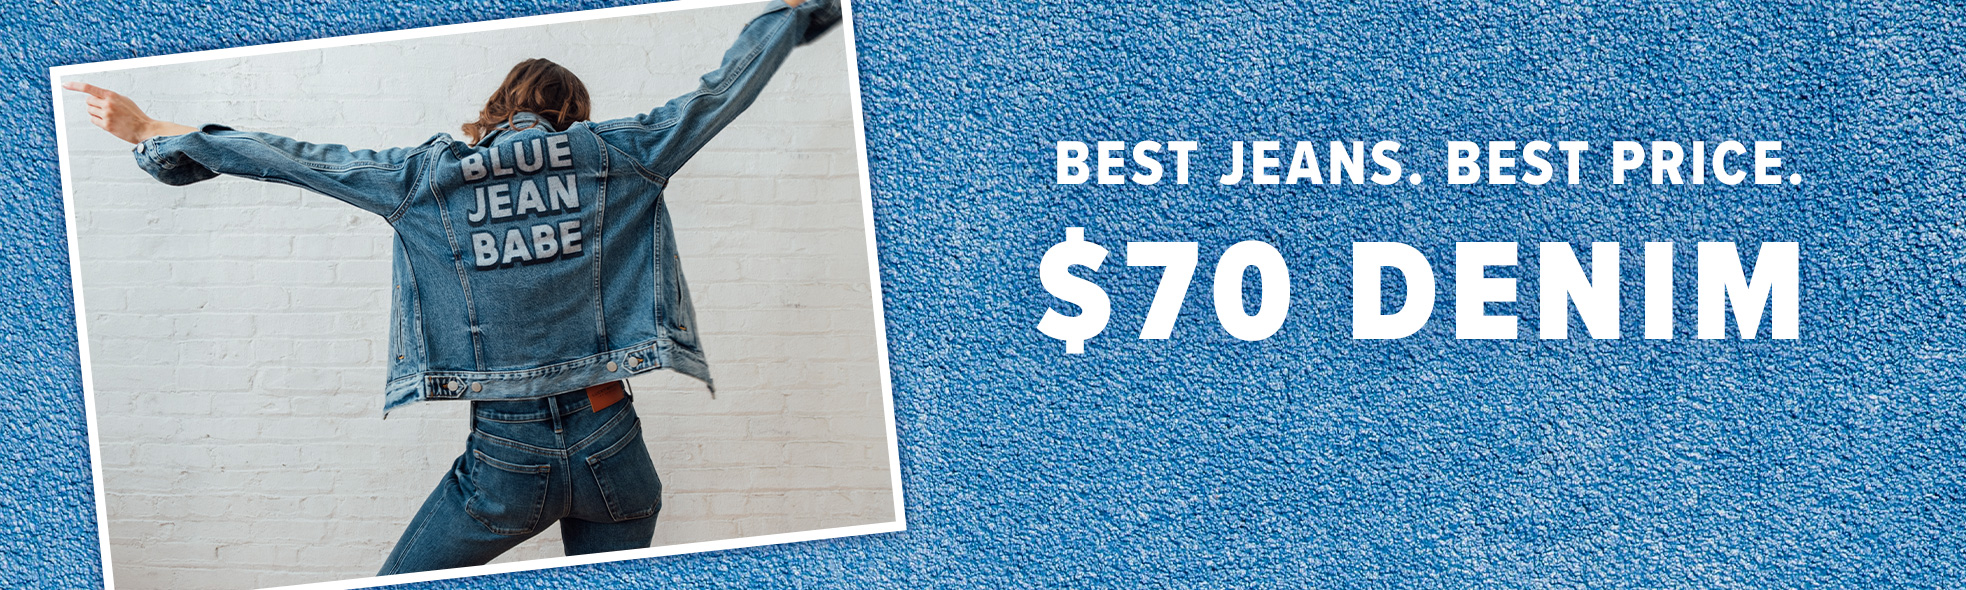 Best Jeans. Best Price. $70 Denim